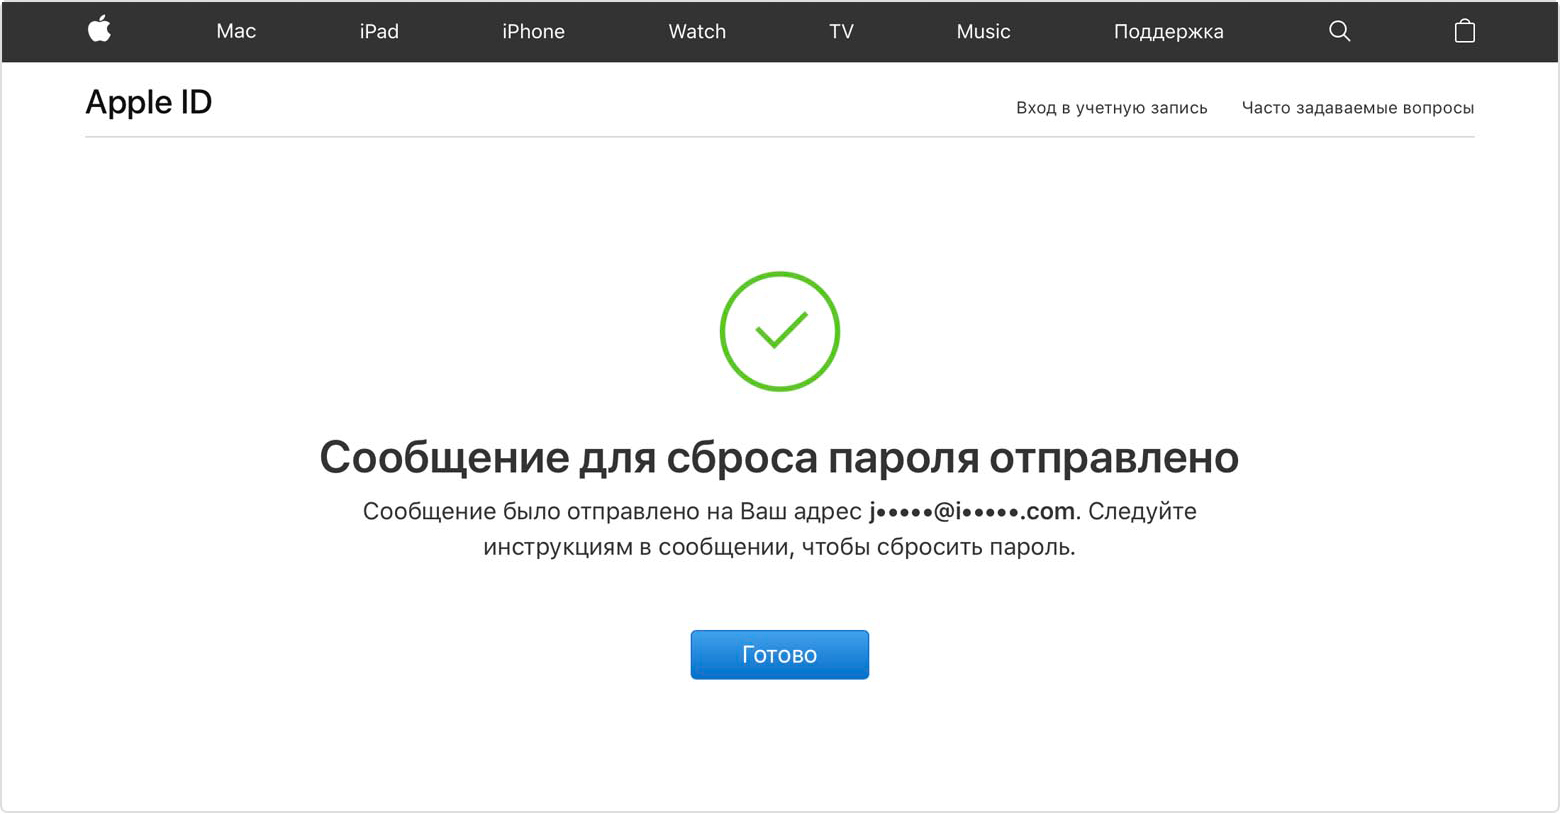 macos-mojave-safari-appleid-password-reset-email.jpg